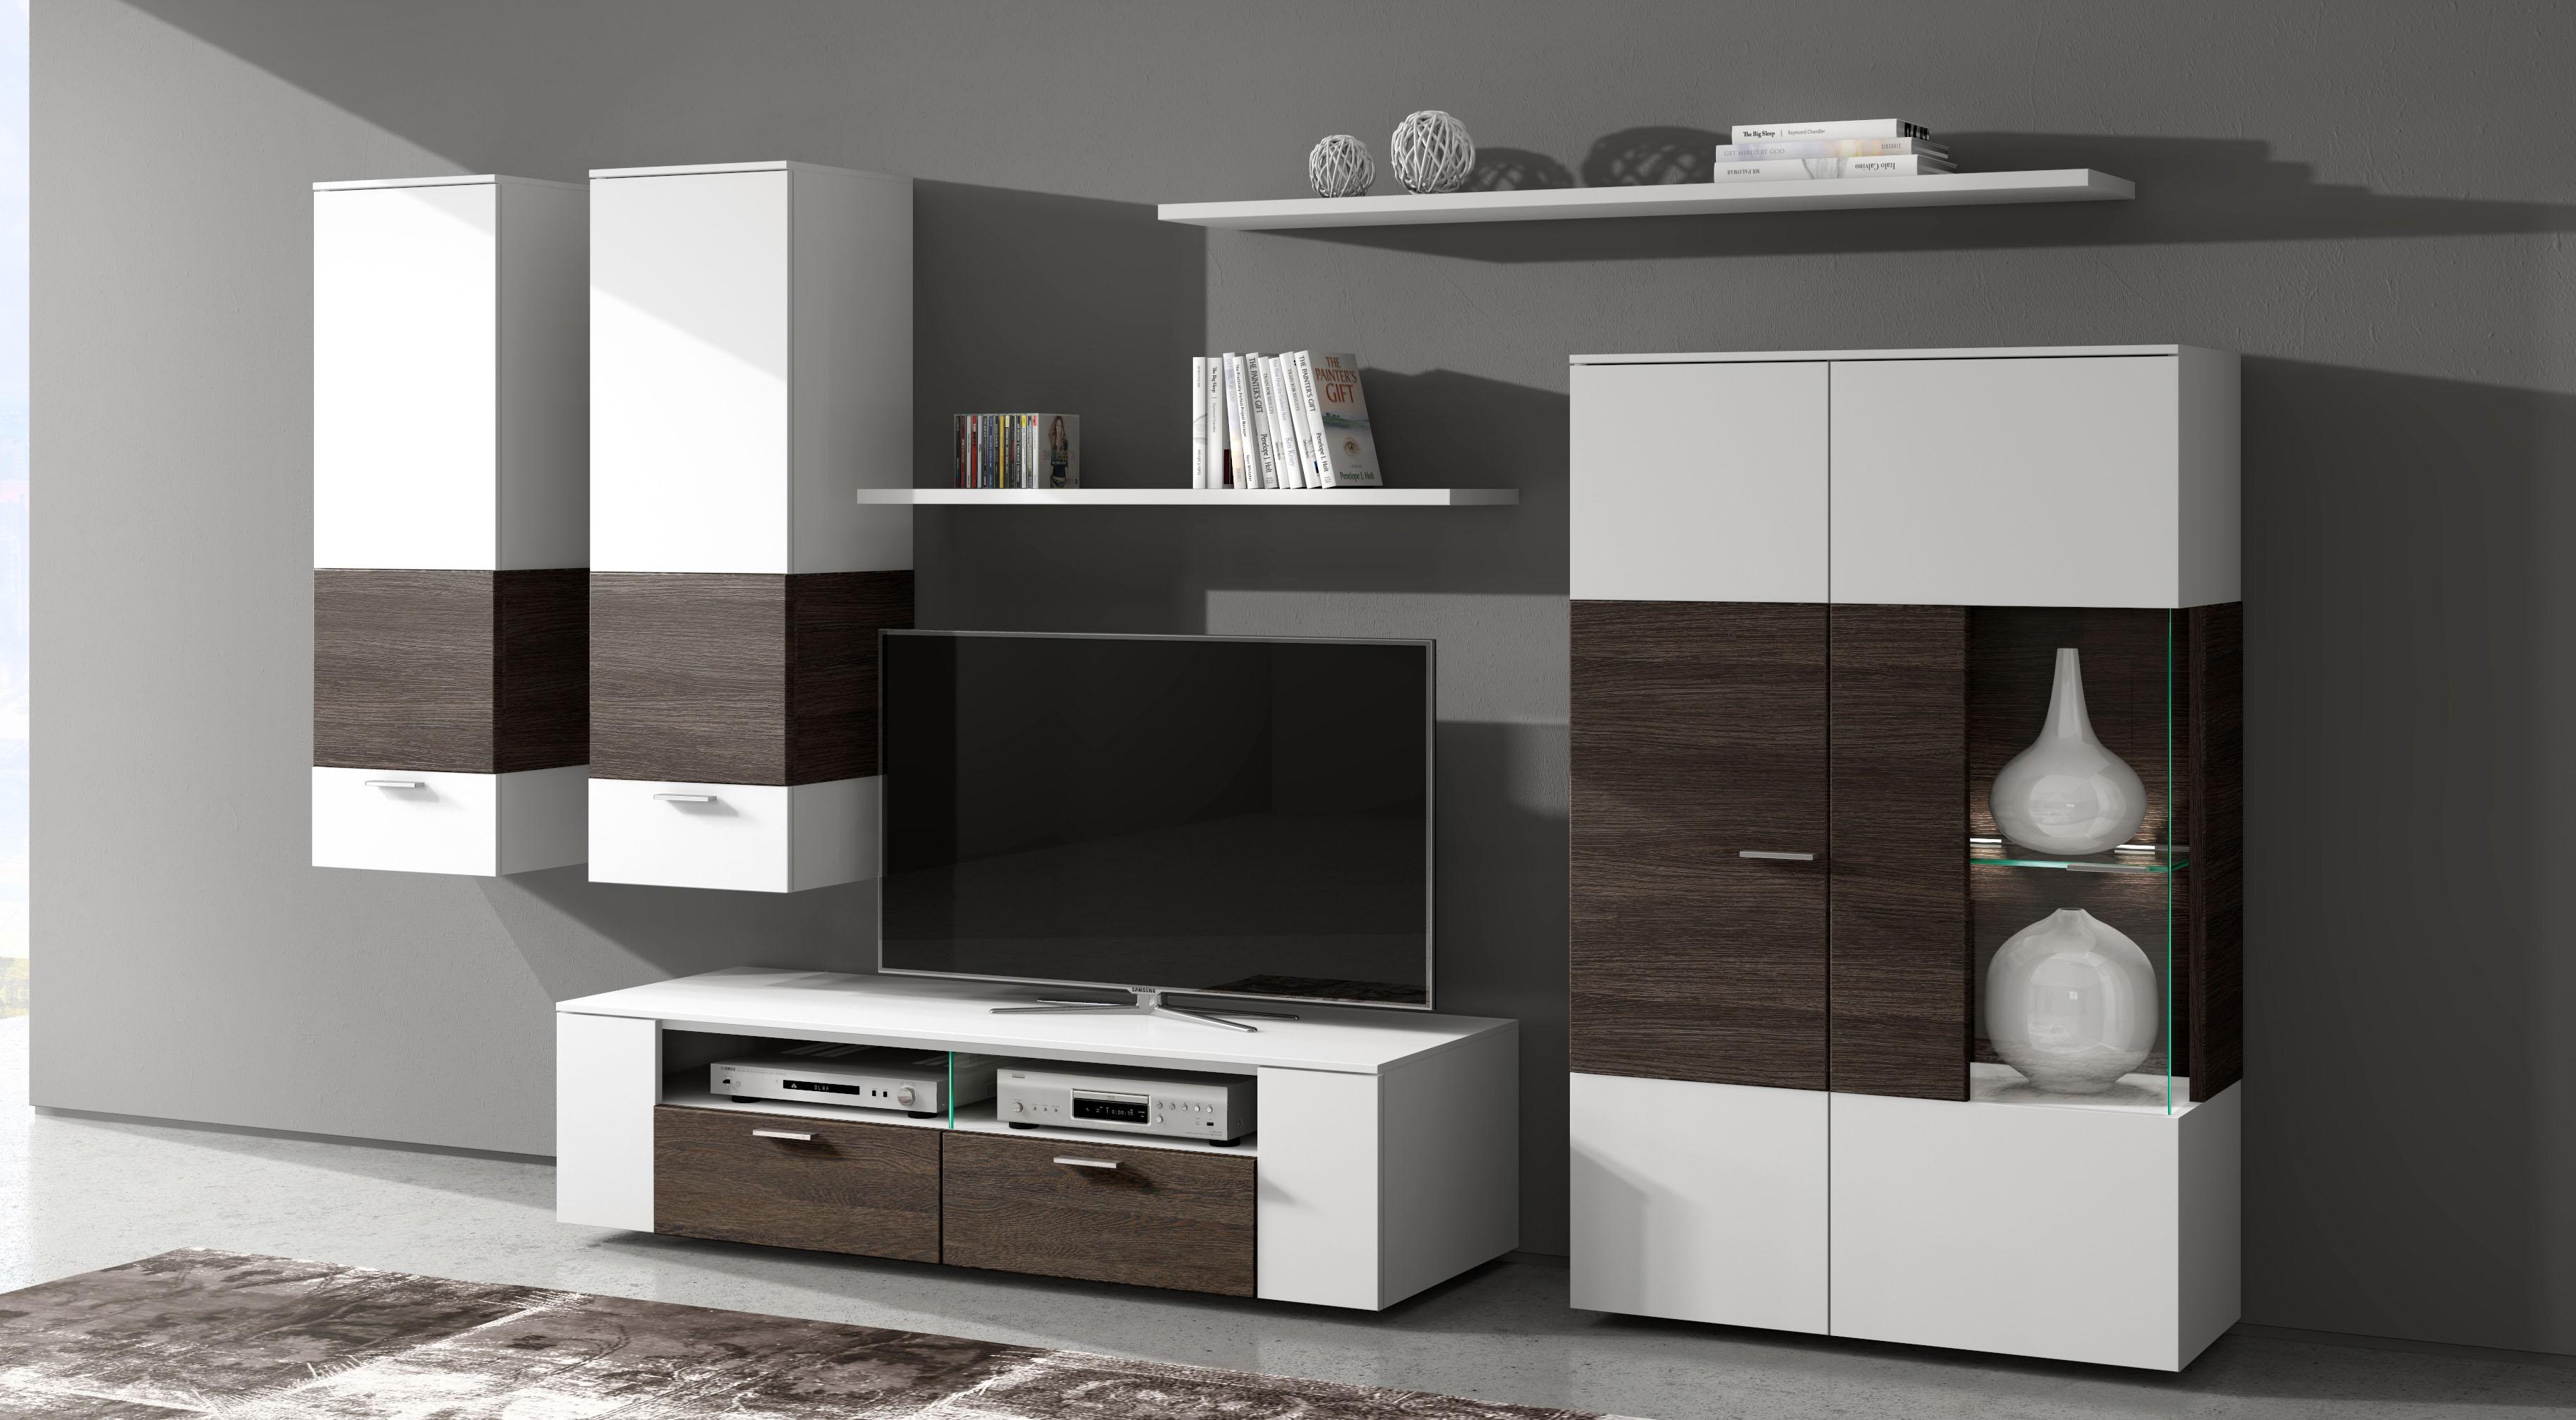 Wunderbar Wohnwand Anbauwand Wohnzimmerset Vitrine Lowboard Schirazz Weiß |  EBay